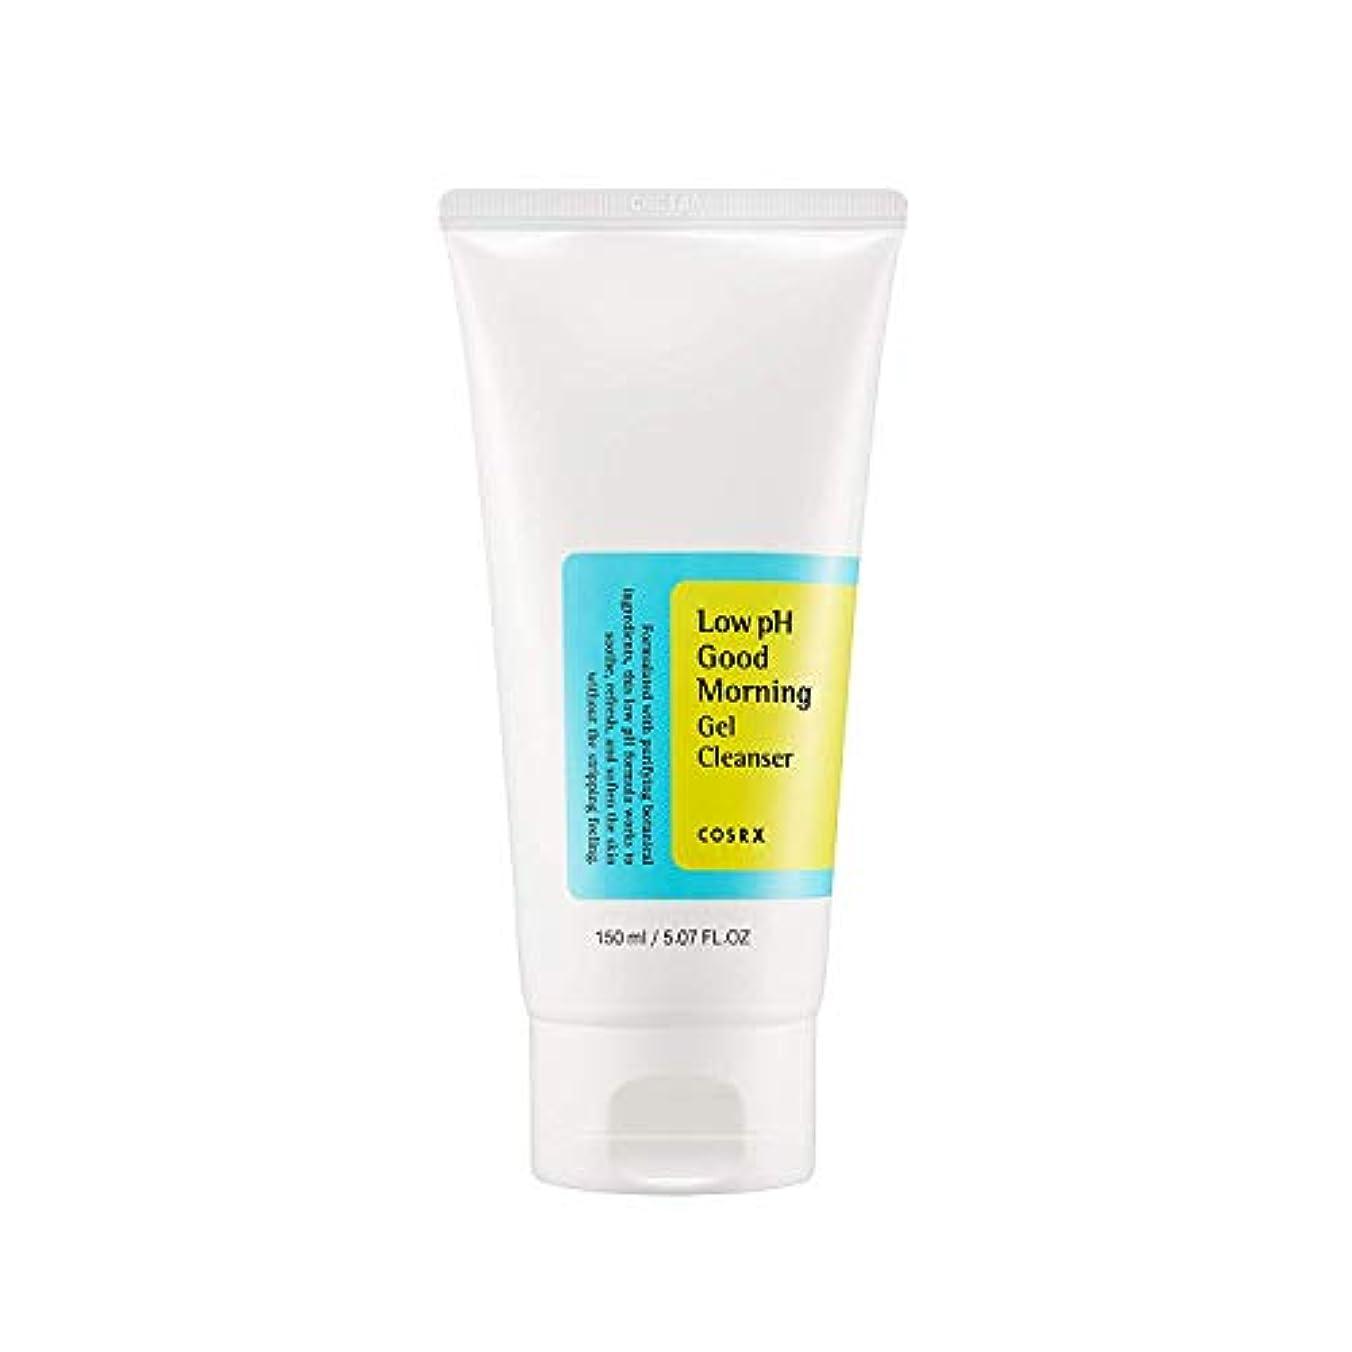 COSRX 弱酸性 グッドモーニング ジェルクレンザー / 敏感肌用 クレンジングジェル / Low PH Good Morning Gel Cleanser (150ml)